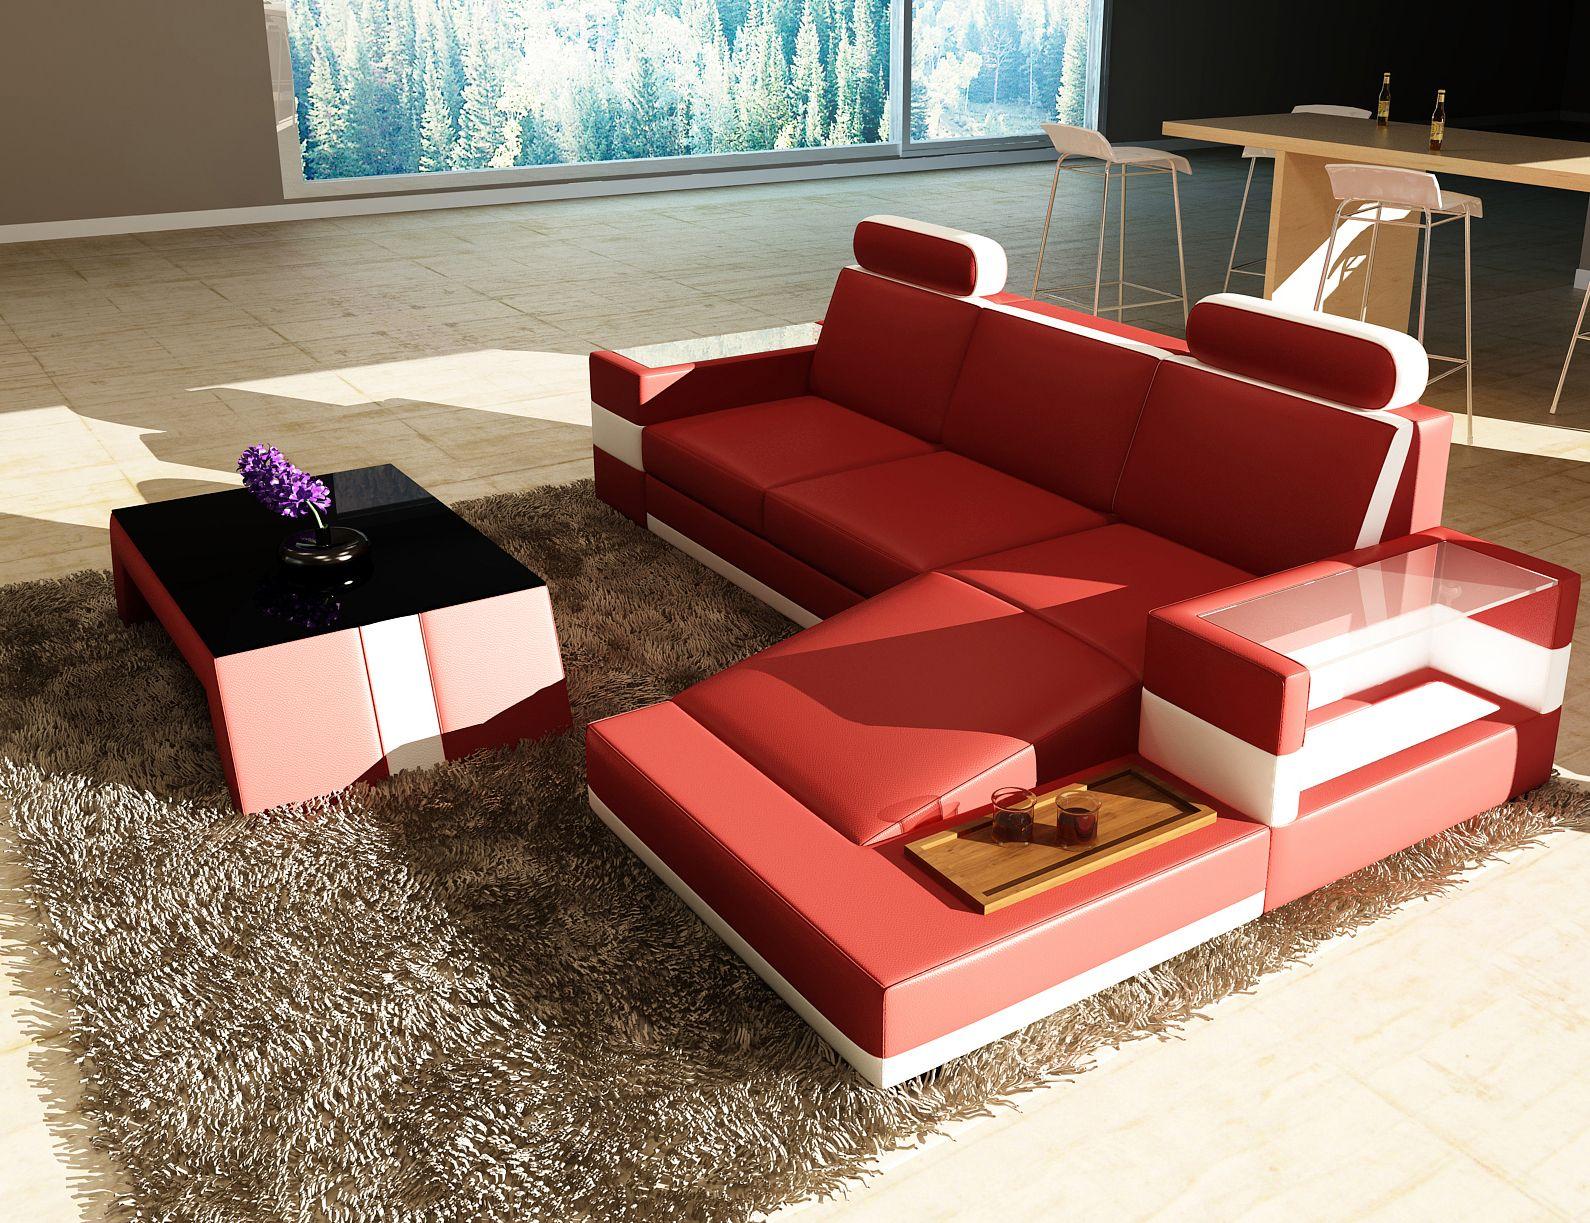 schnittsofa schnittsofa modell 5100bdie m bel aus italien. Black Bedroom Furniture Sets. Home Design Ideas